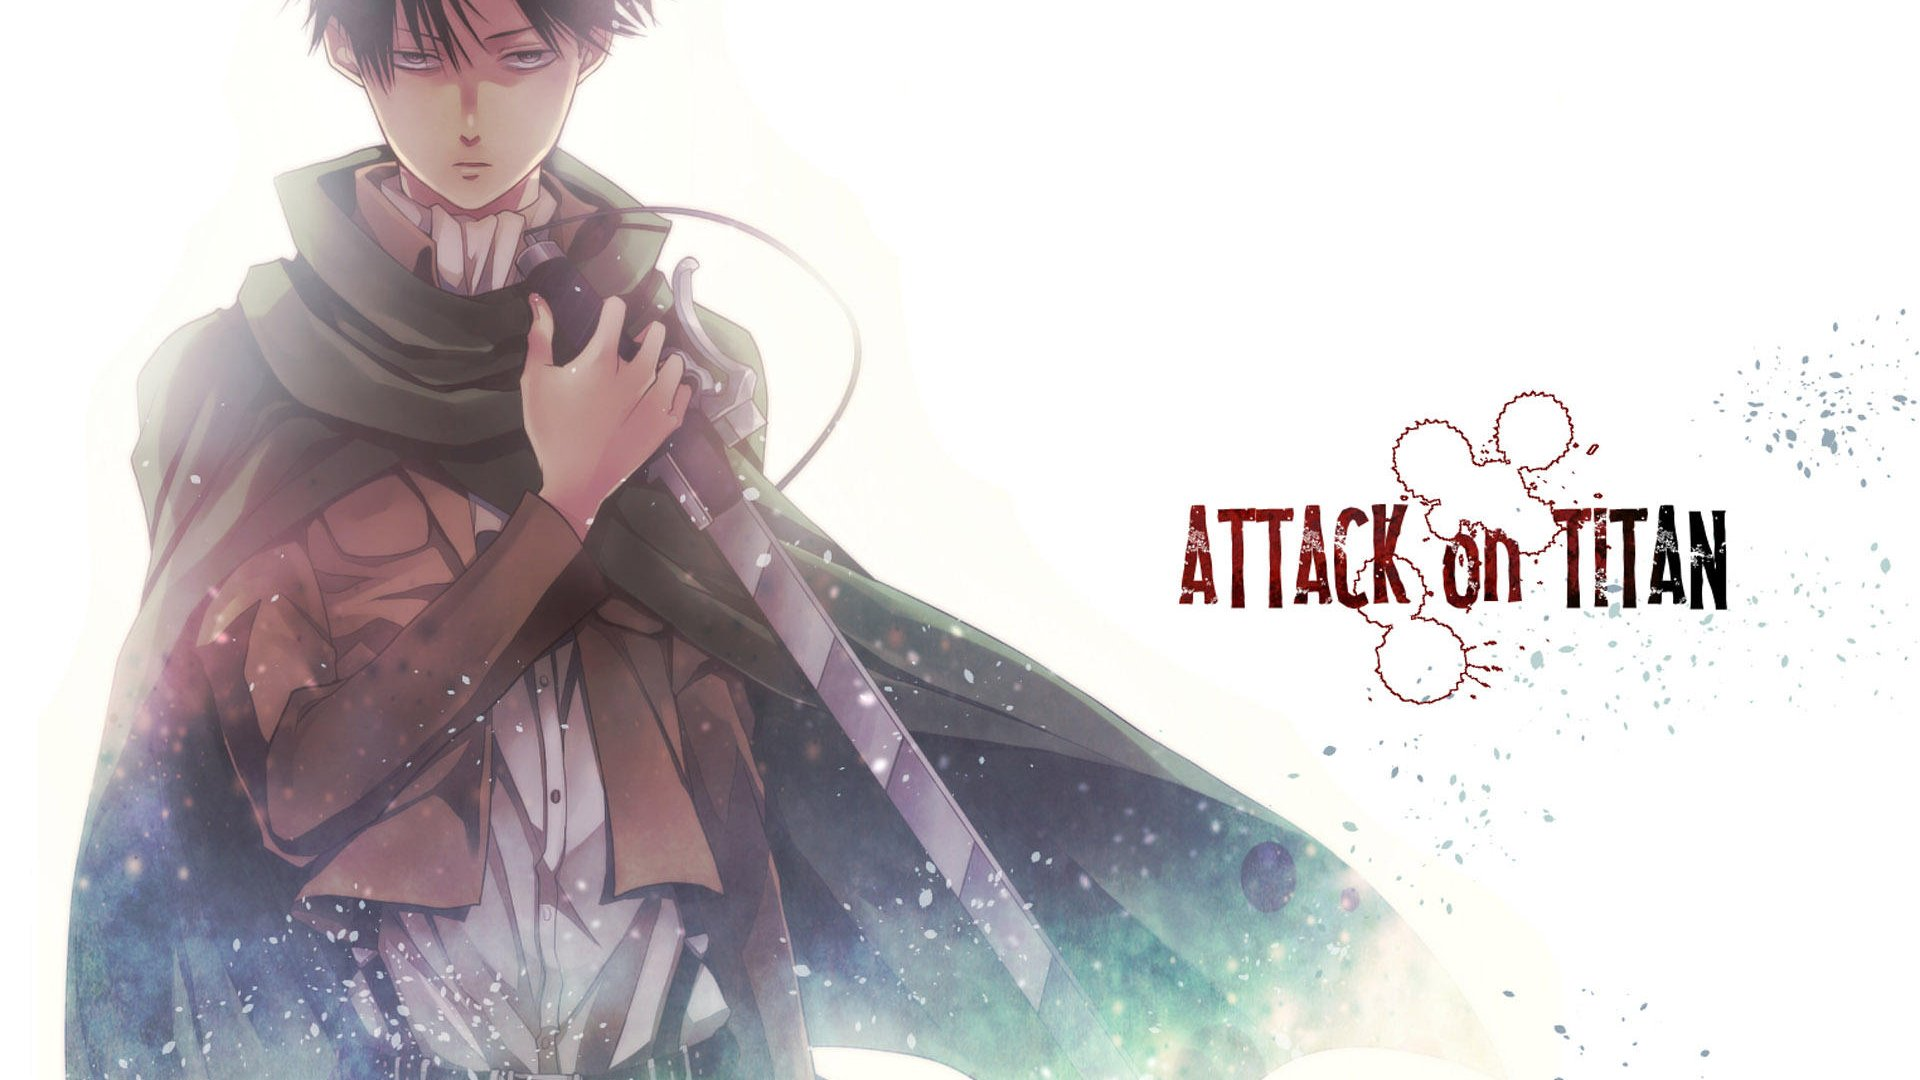 49 Attack On Titan Wallpaper Hd On Wallpapersafari